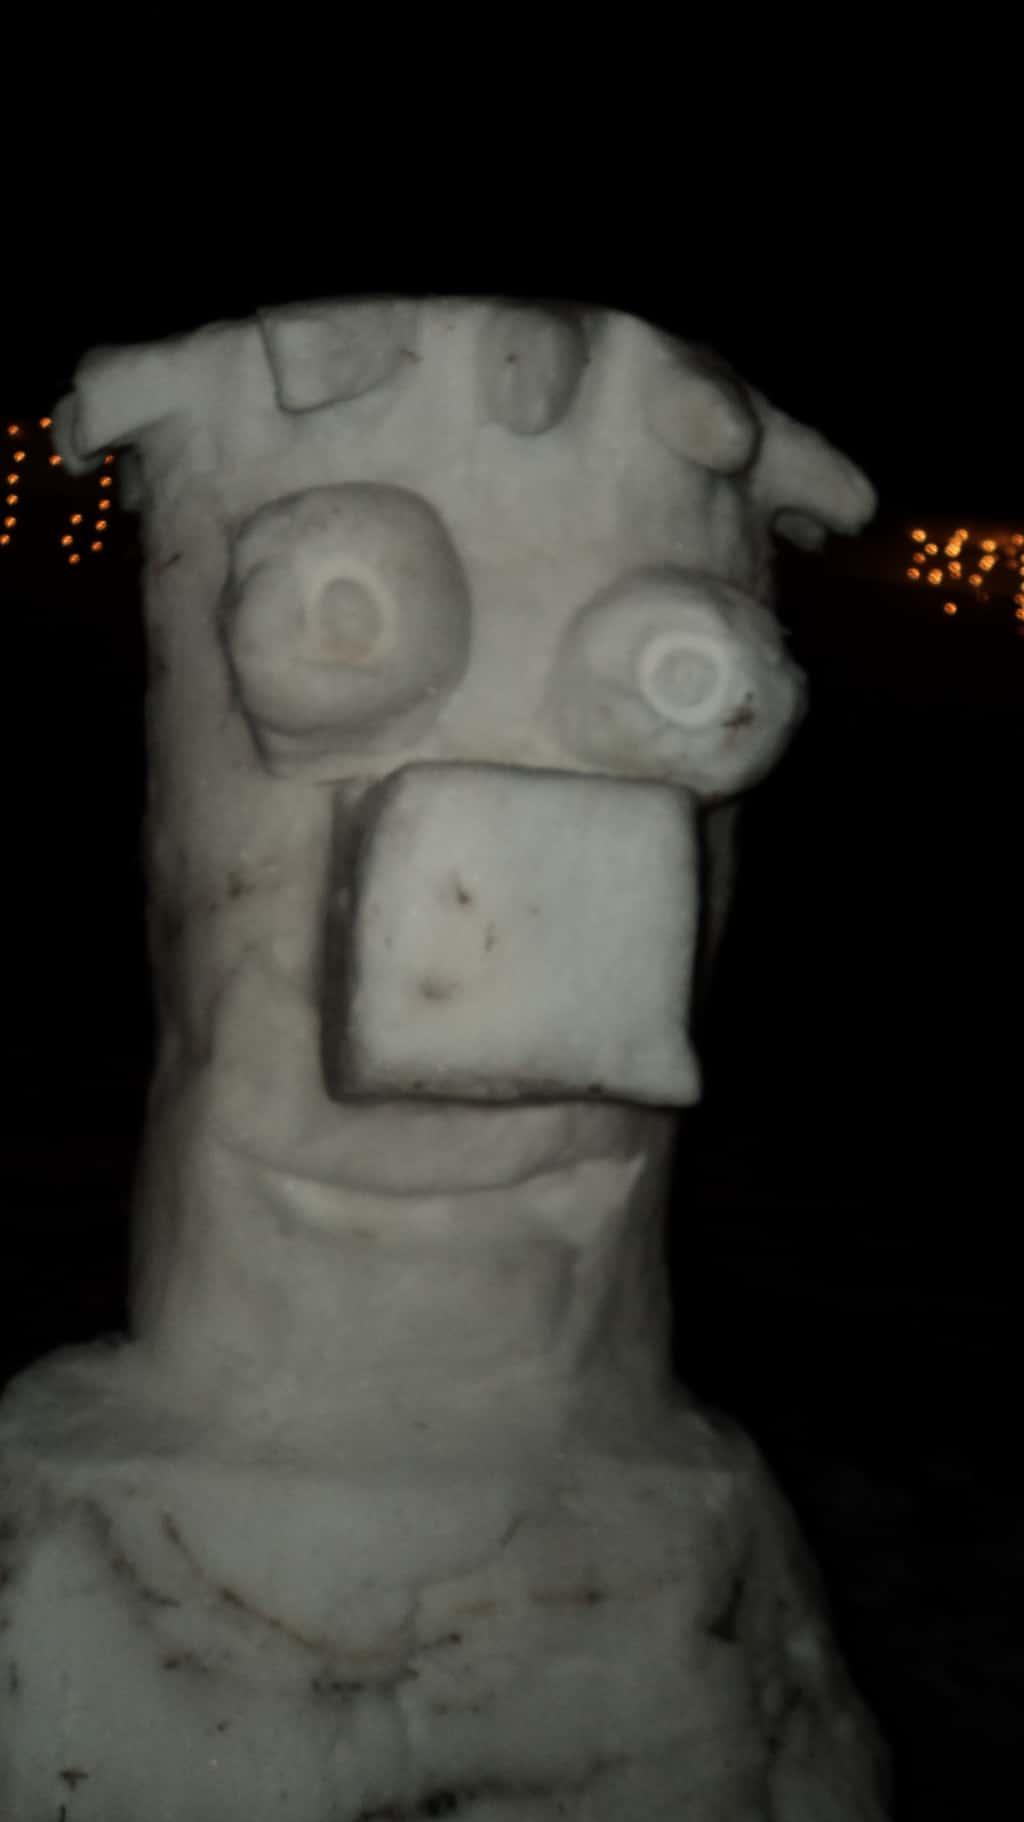 Ferb Snowman